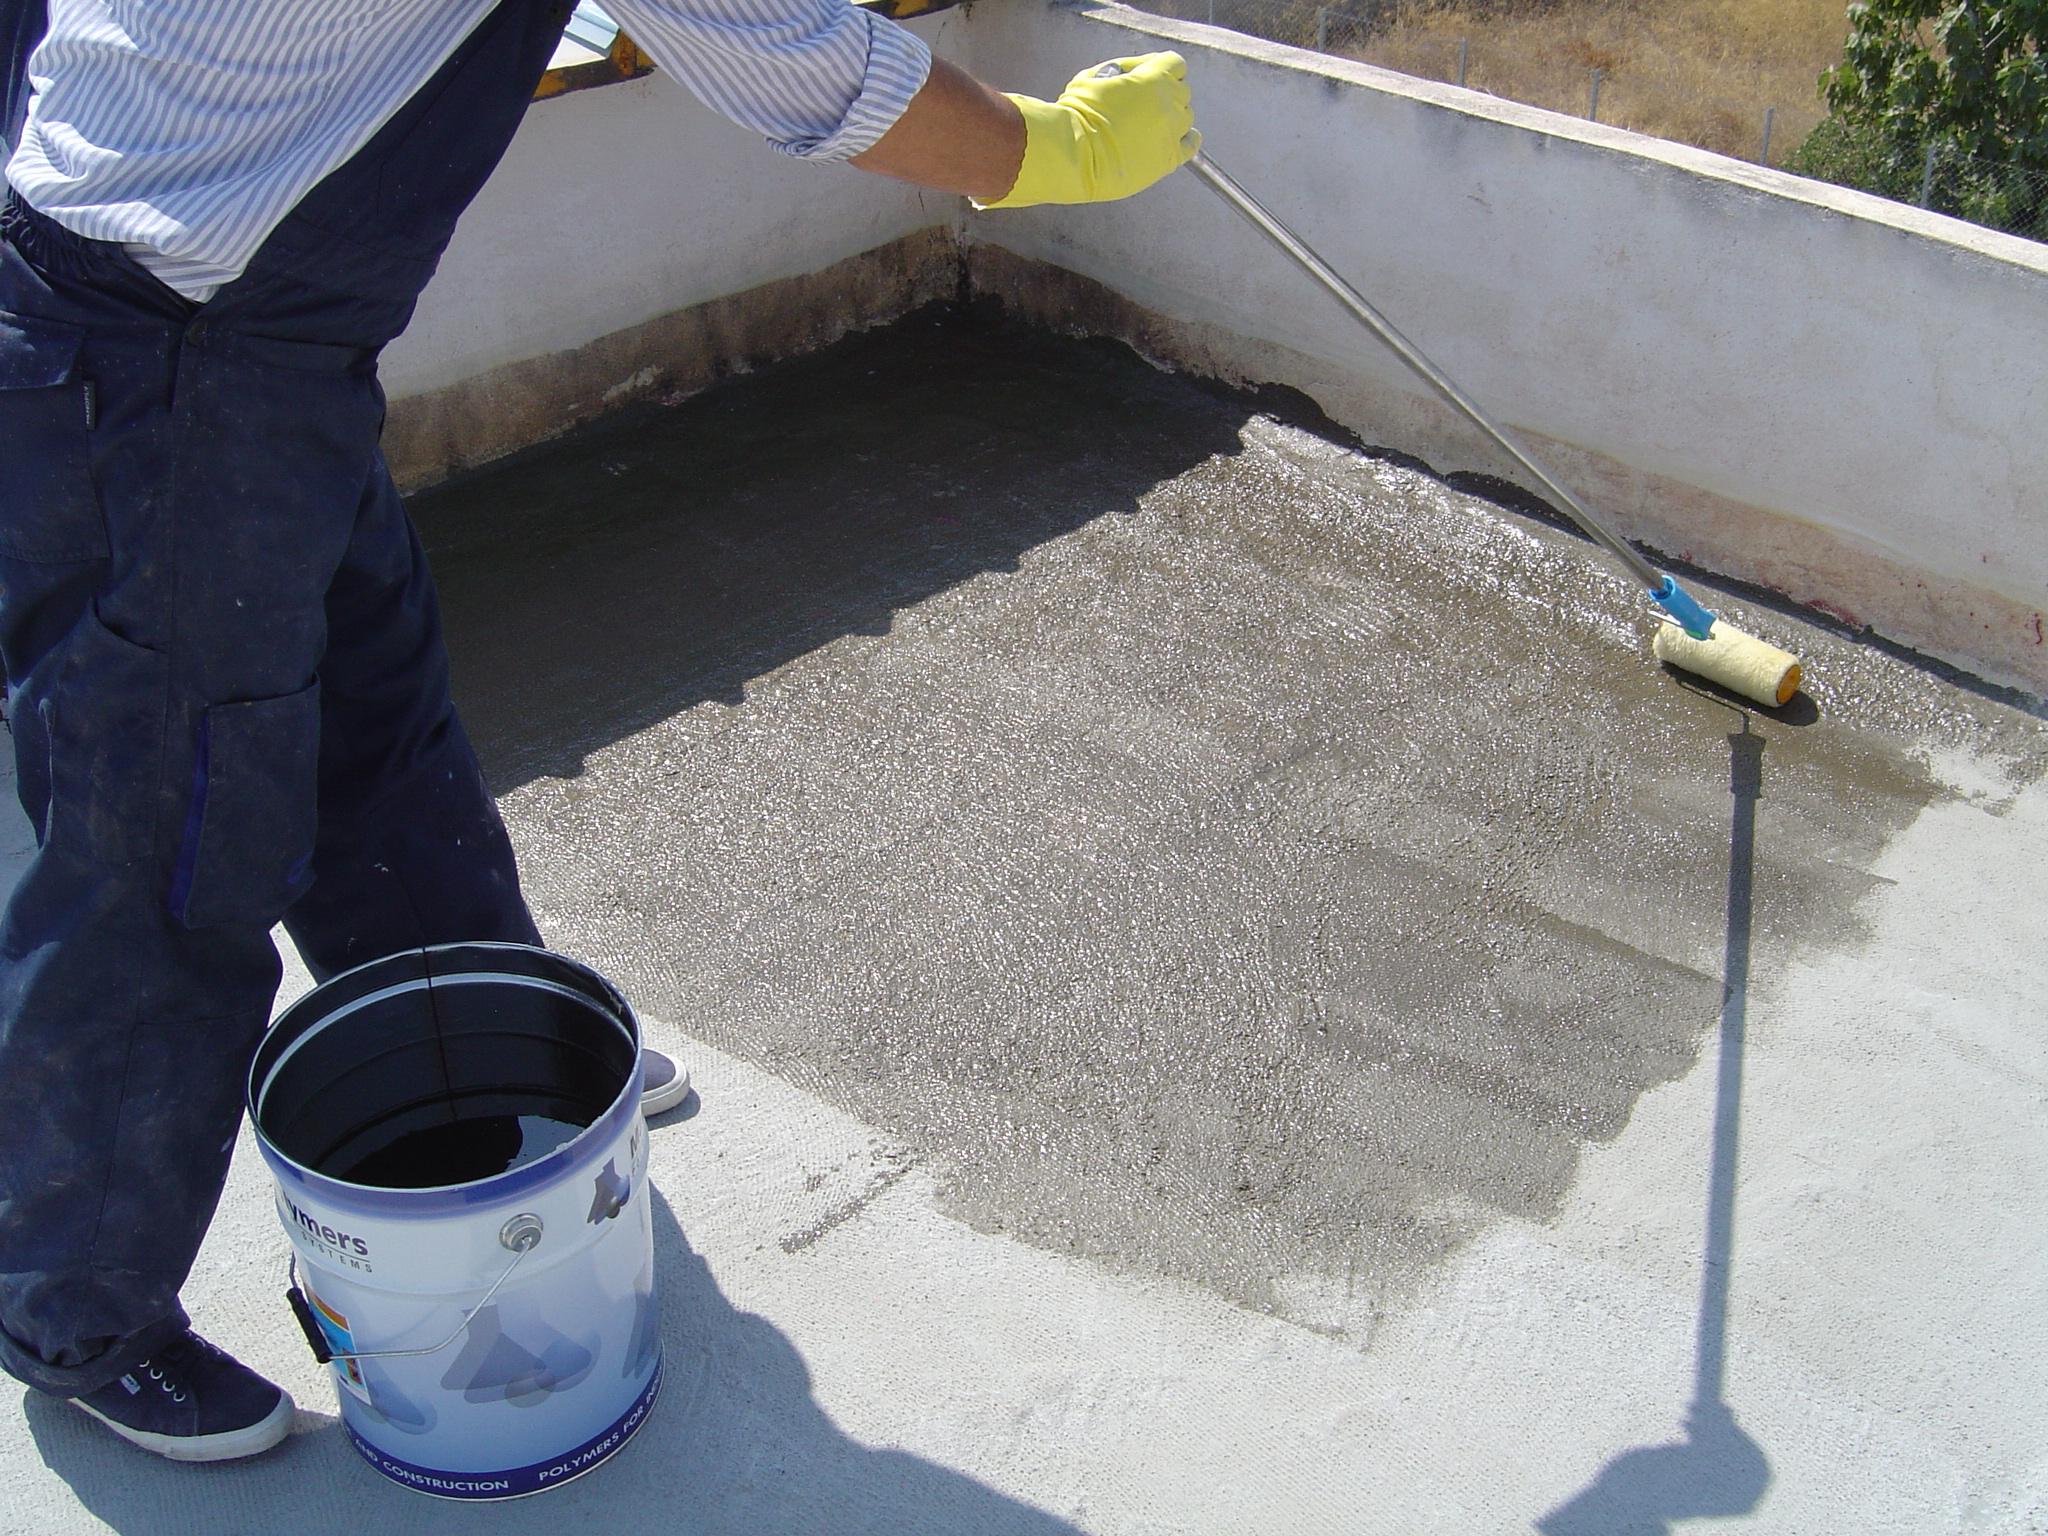 Aplicarea amorsei - Hidroizolarea corecta a unui acoperis si protectia membranei cu materiale reflexive